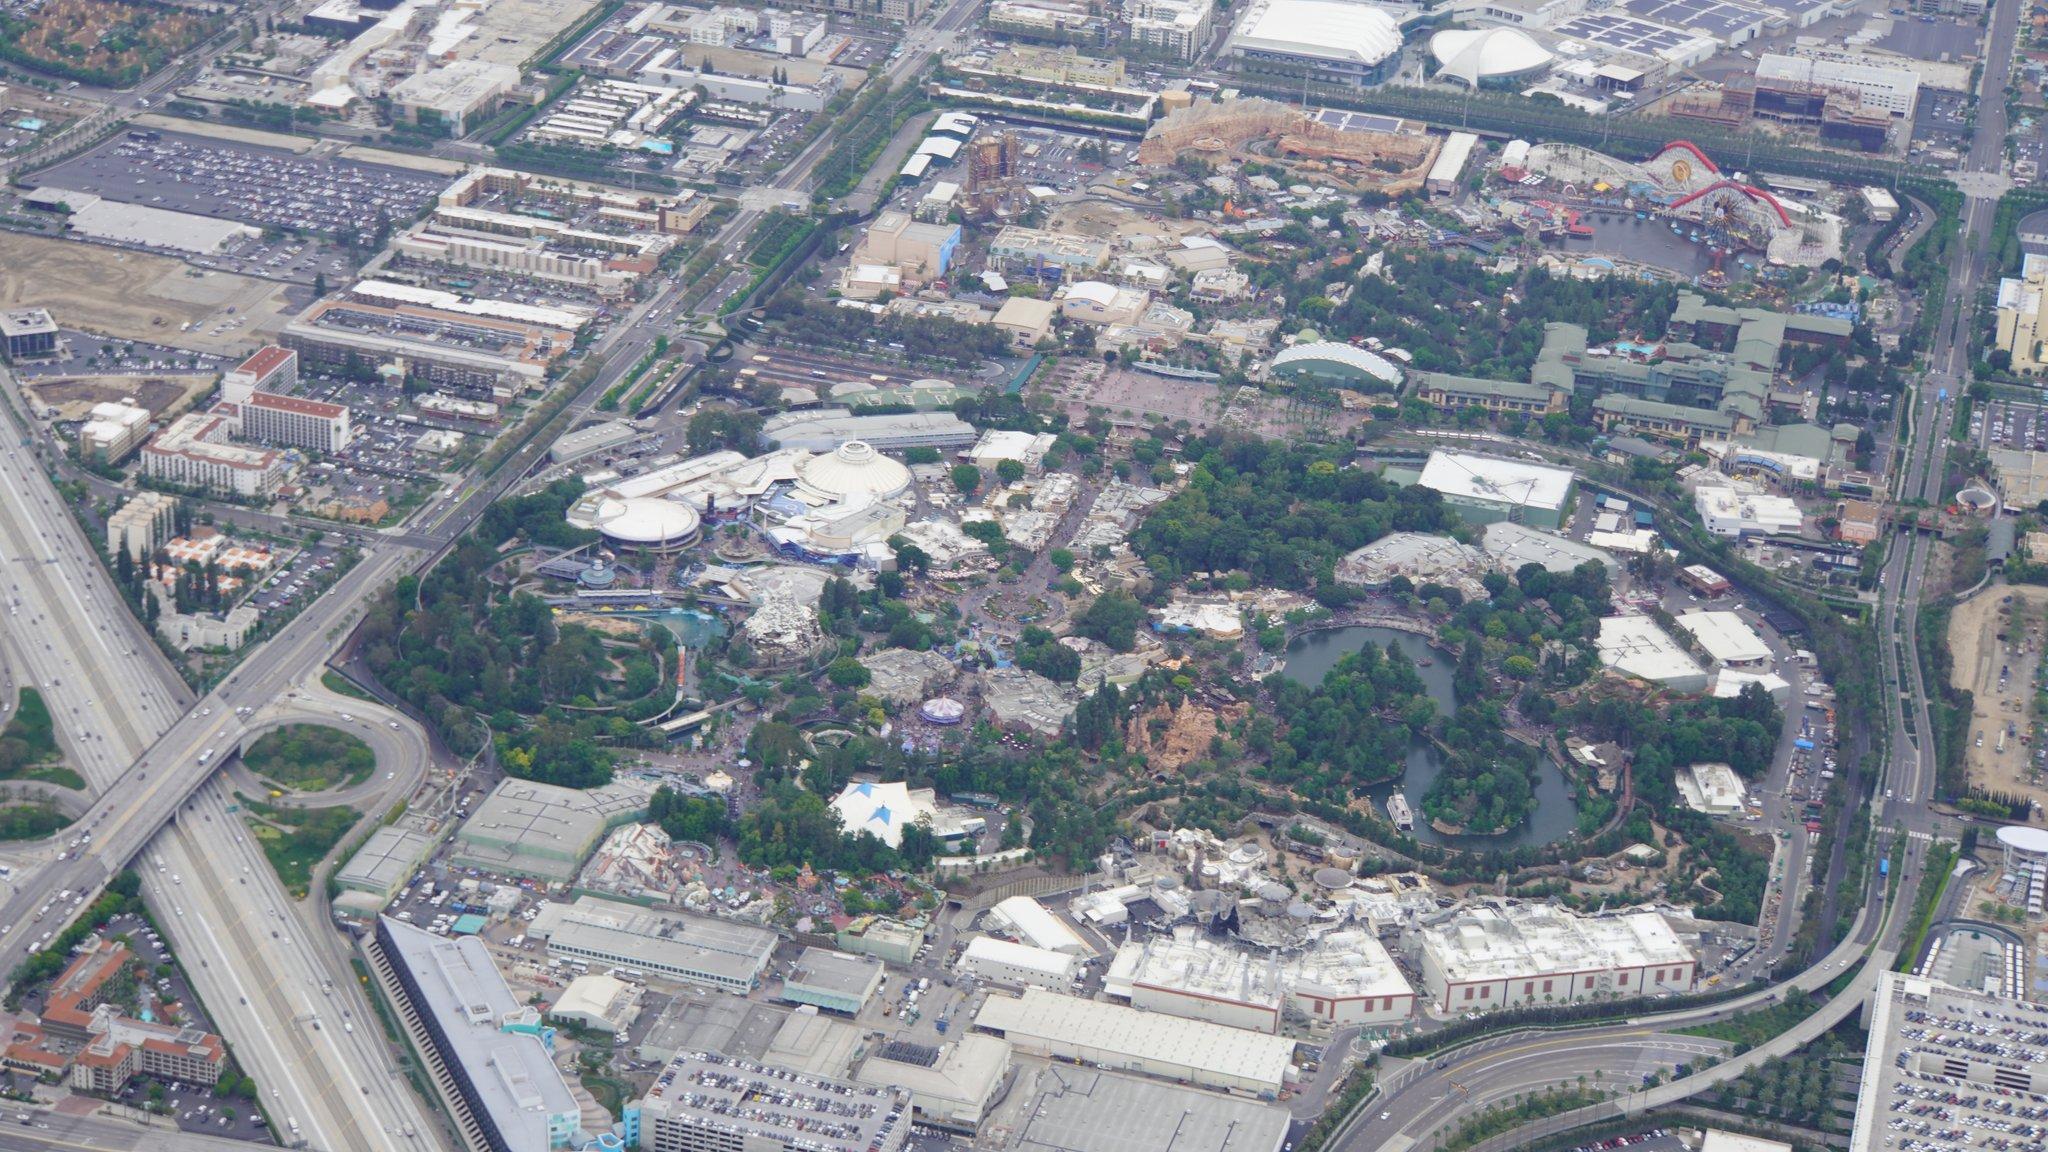 Disneyland Resort vu du ciel, des images sublimes! D6CLO8dVUAAEMzw